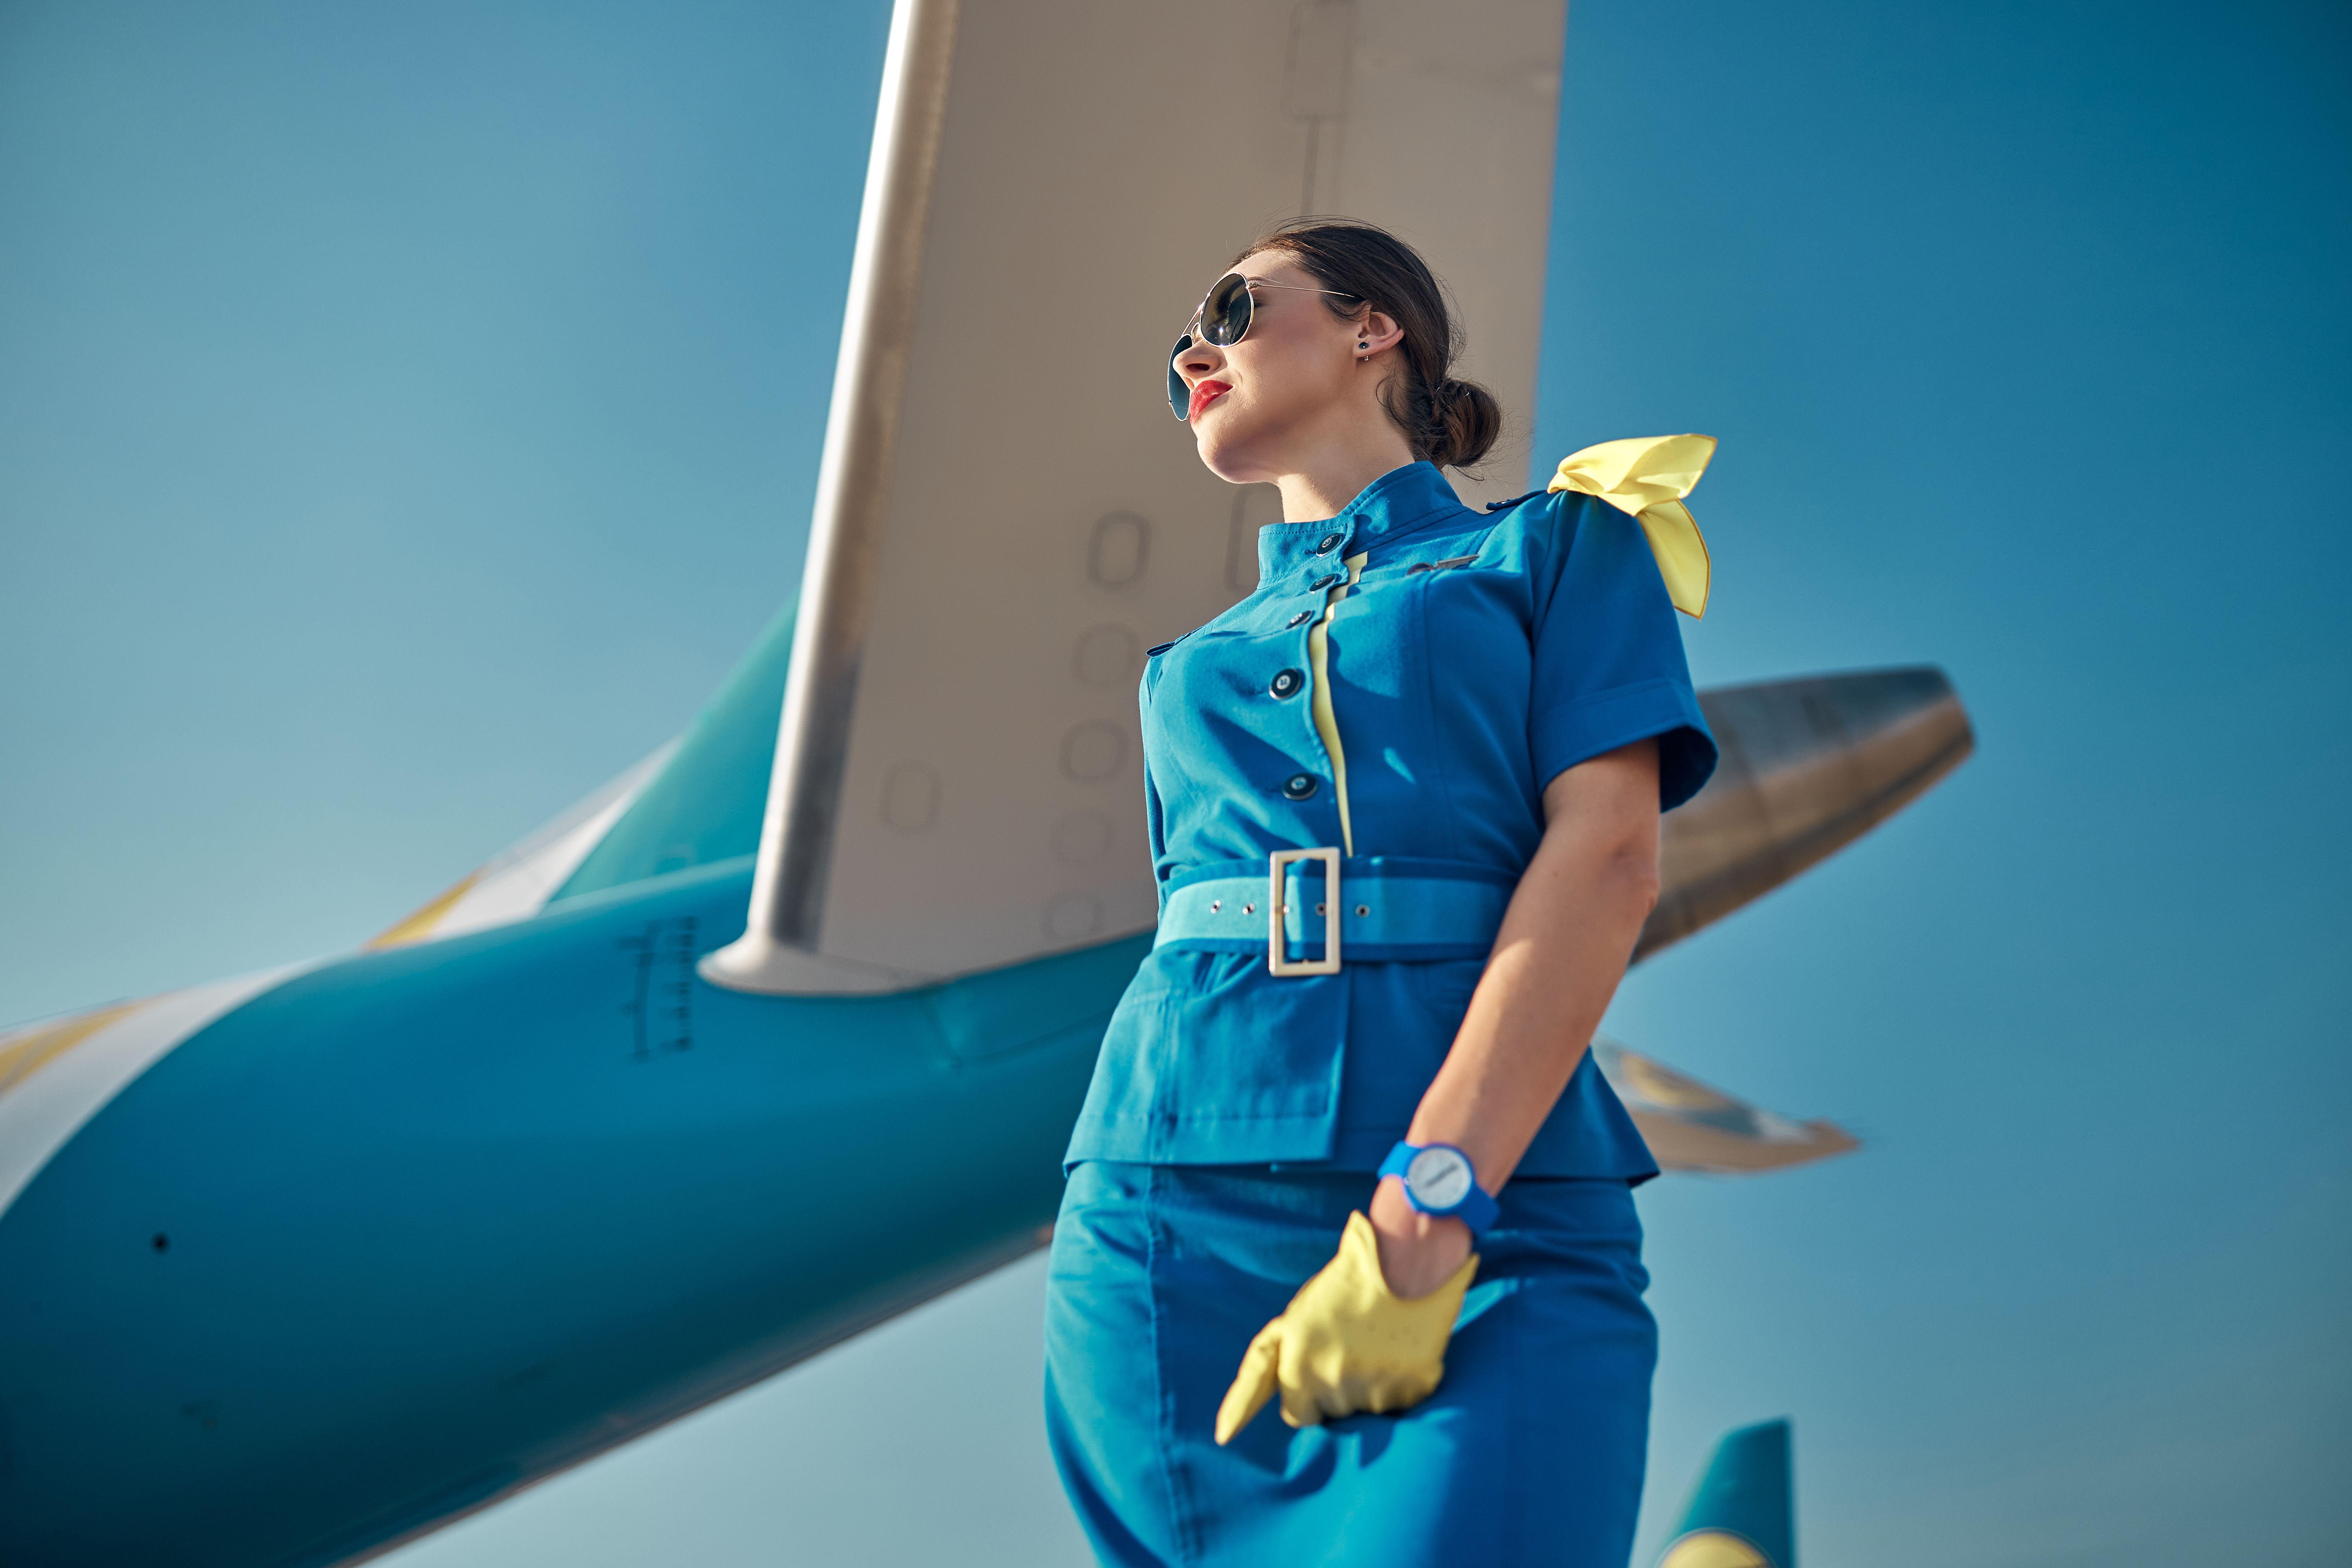 Cabin Crew Career In 2021 Cabin Crew Flight Attendant Life Airline Jobs